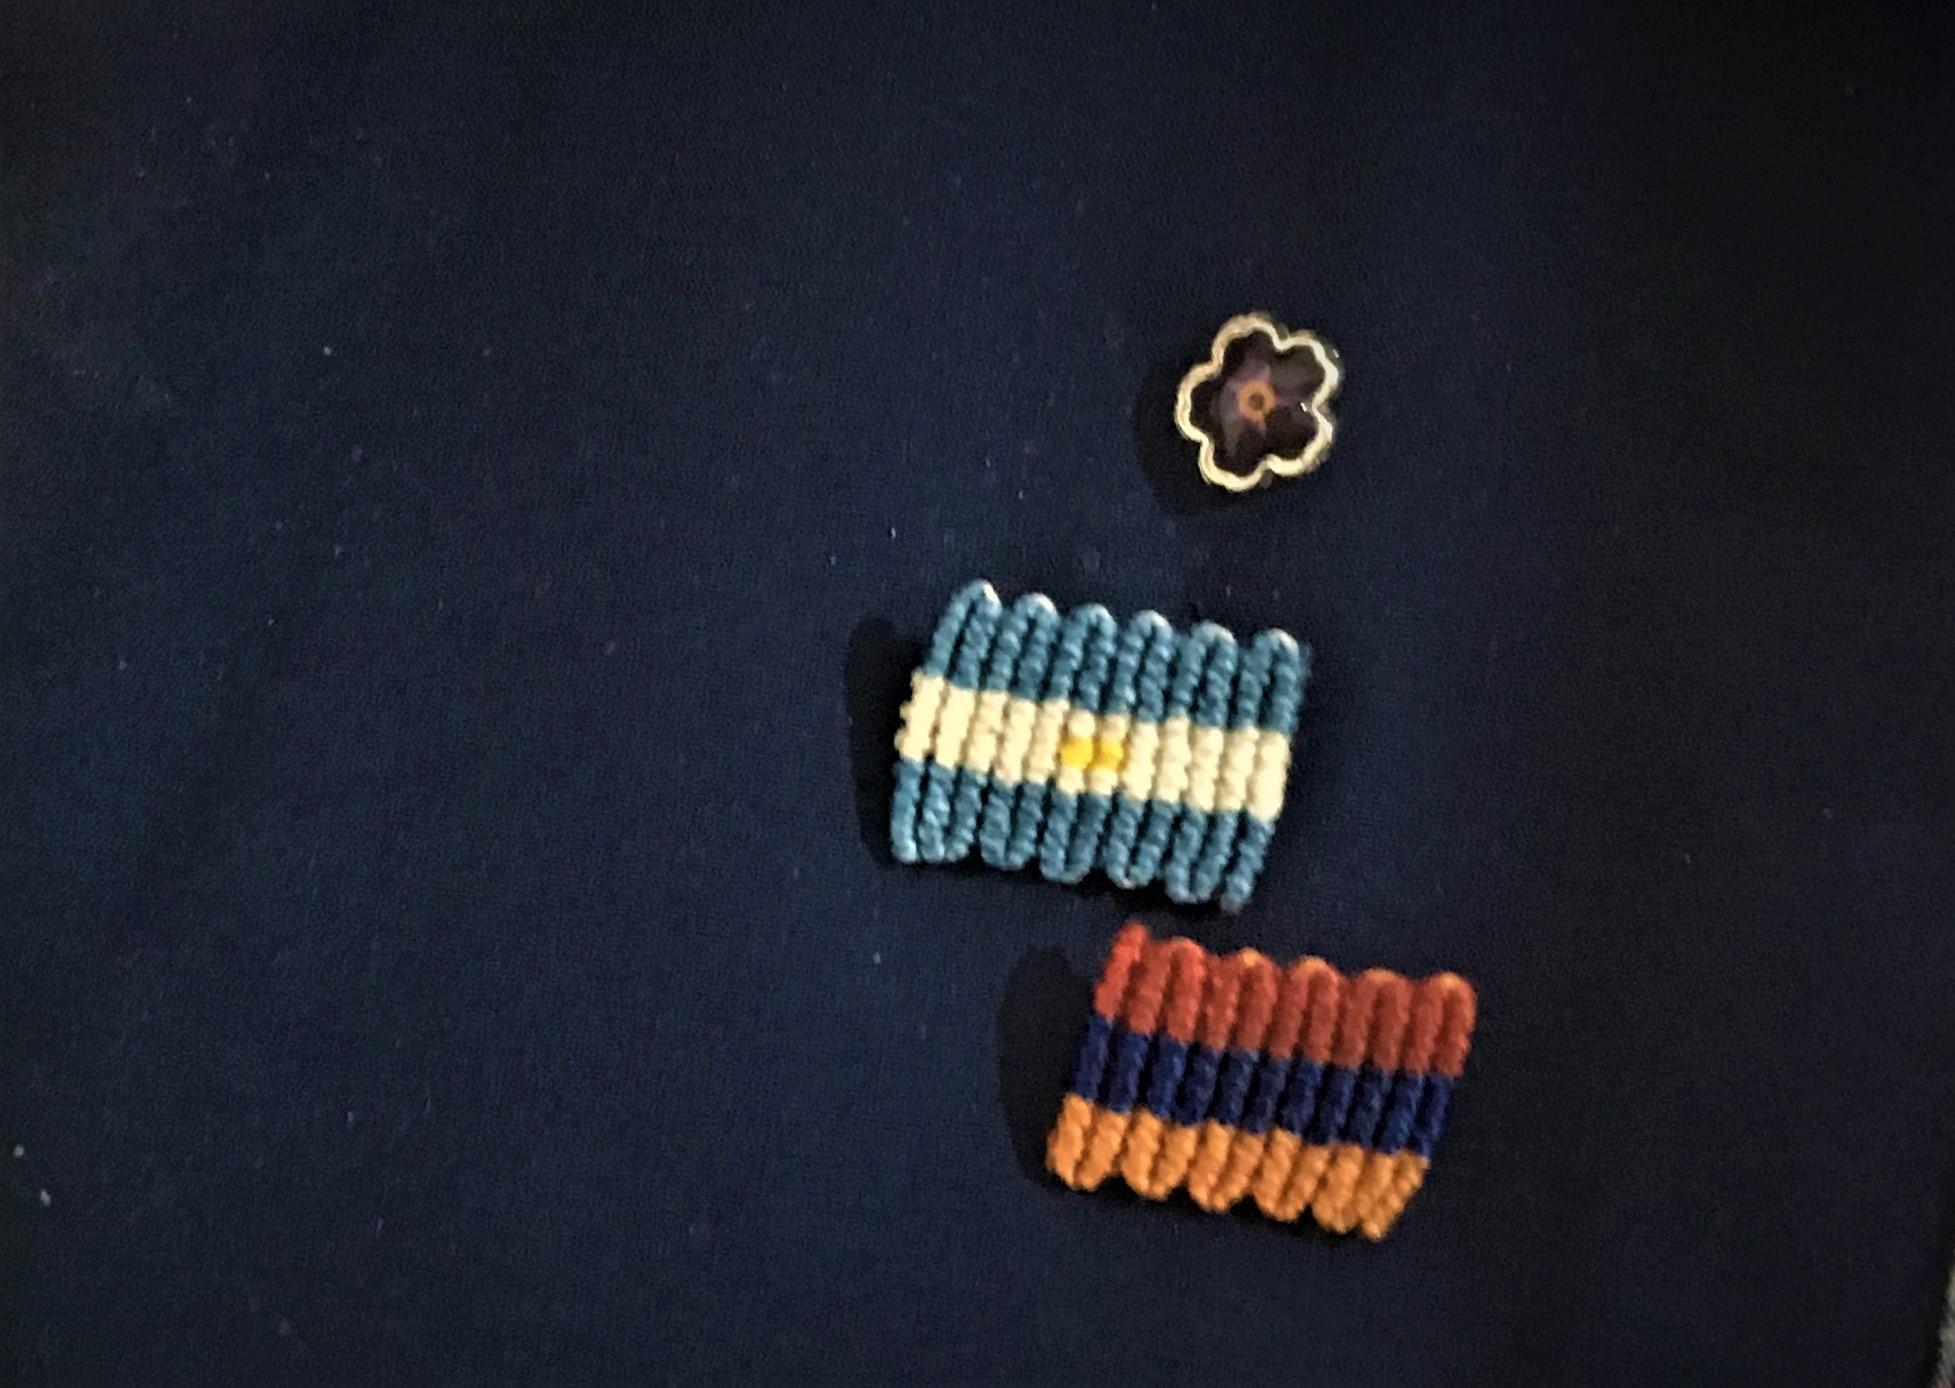 ADS Argentina Armenia flags 3.jpg